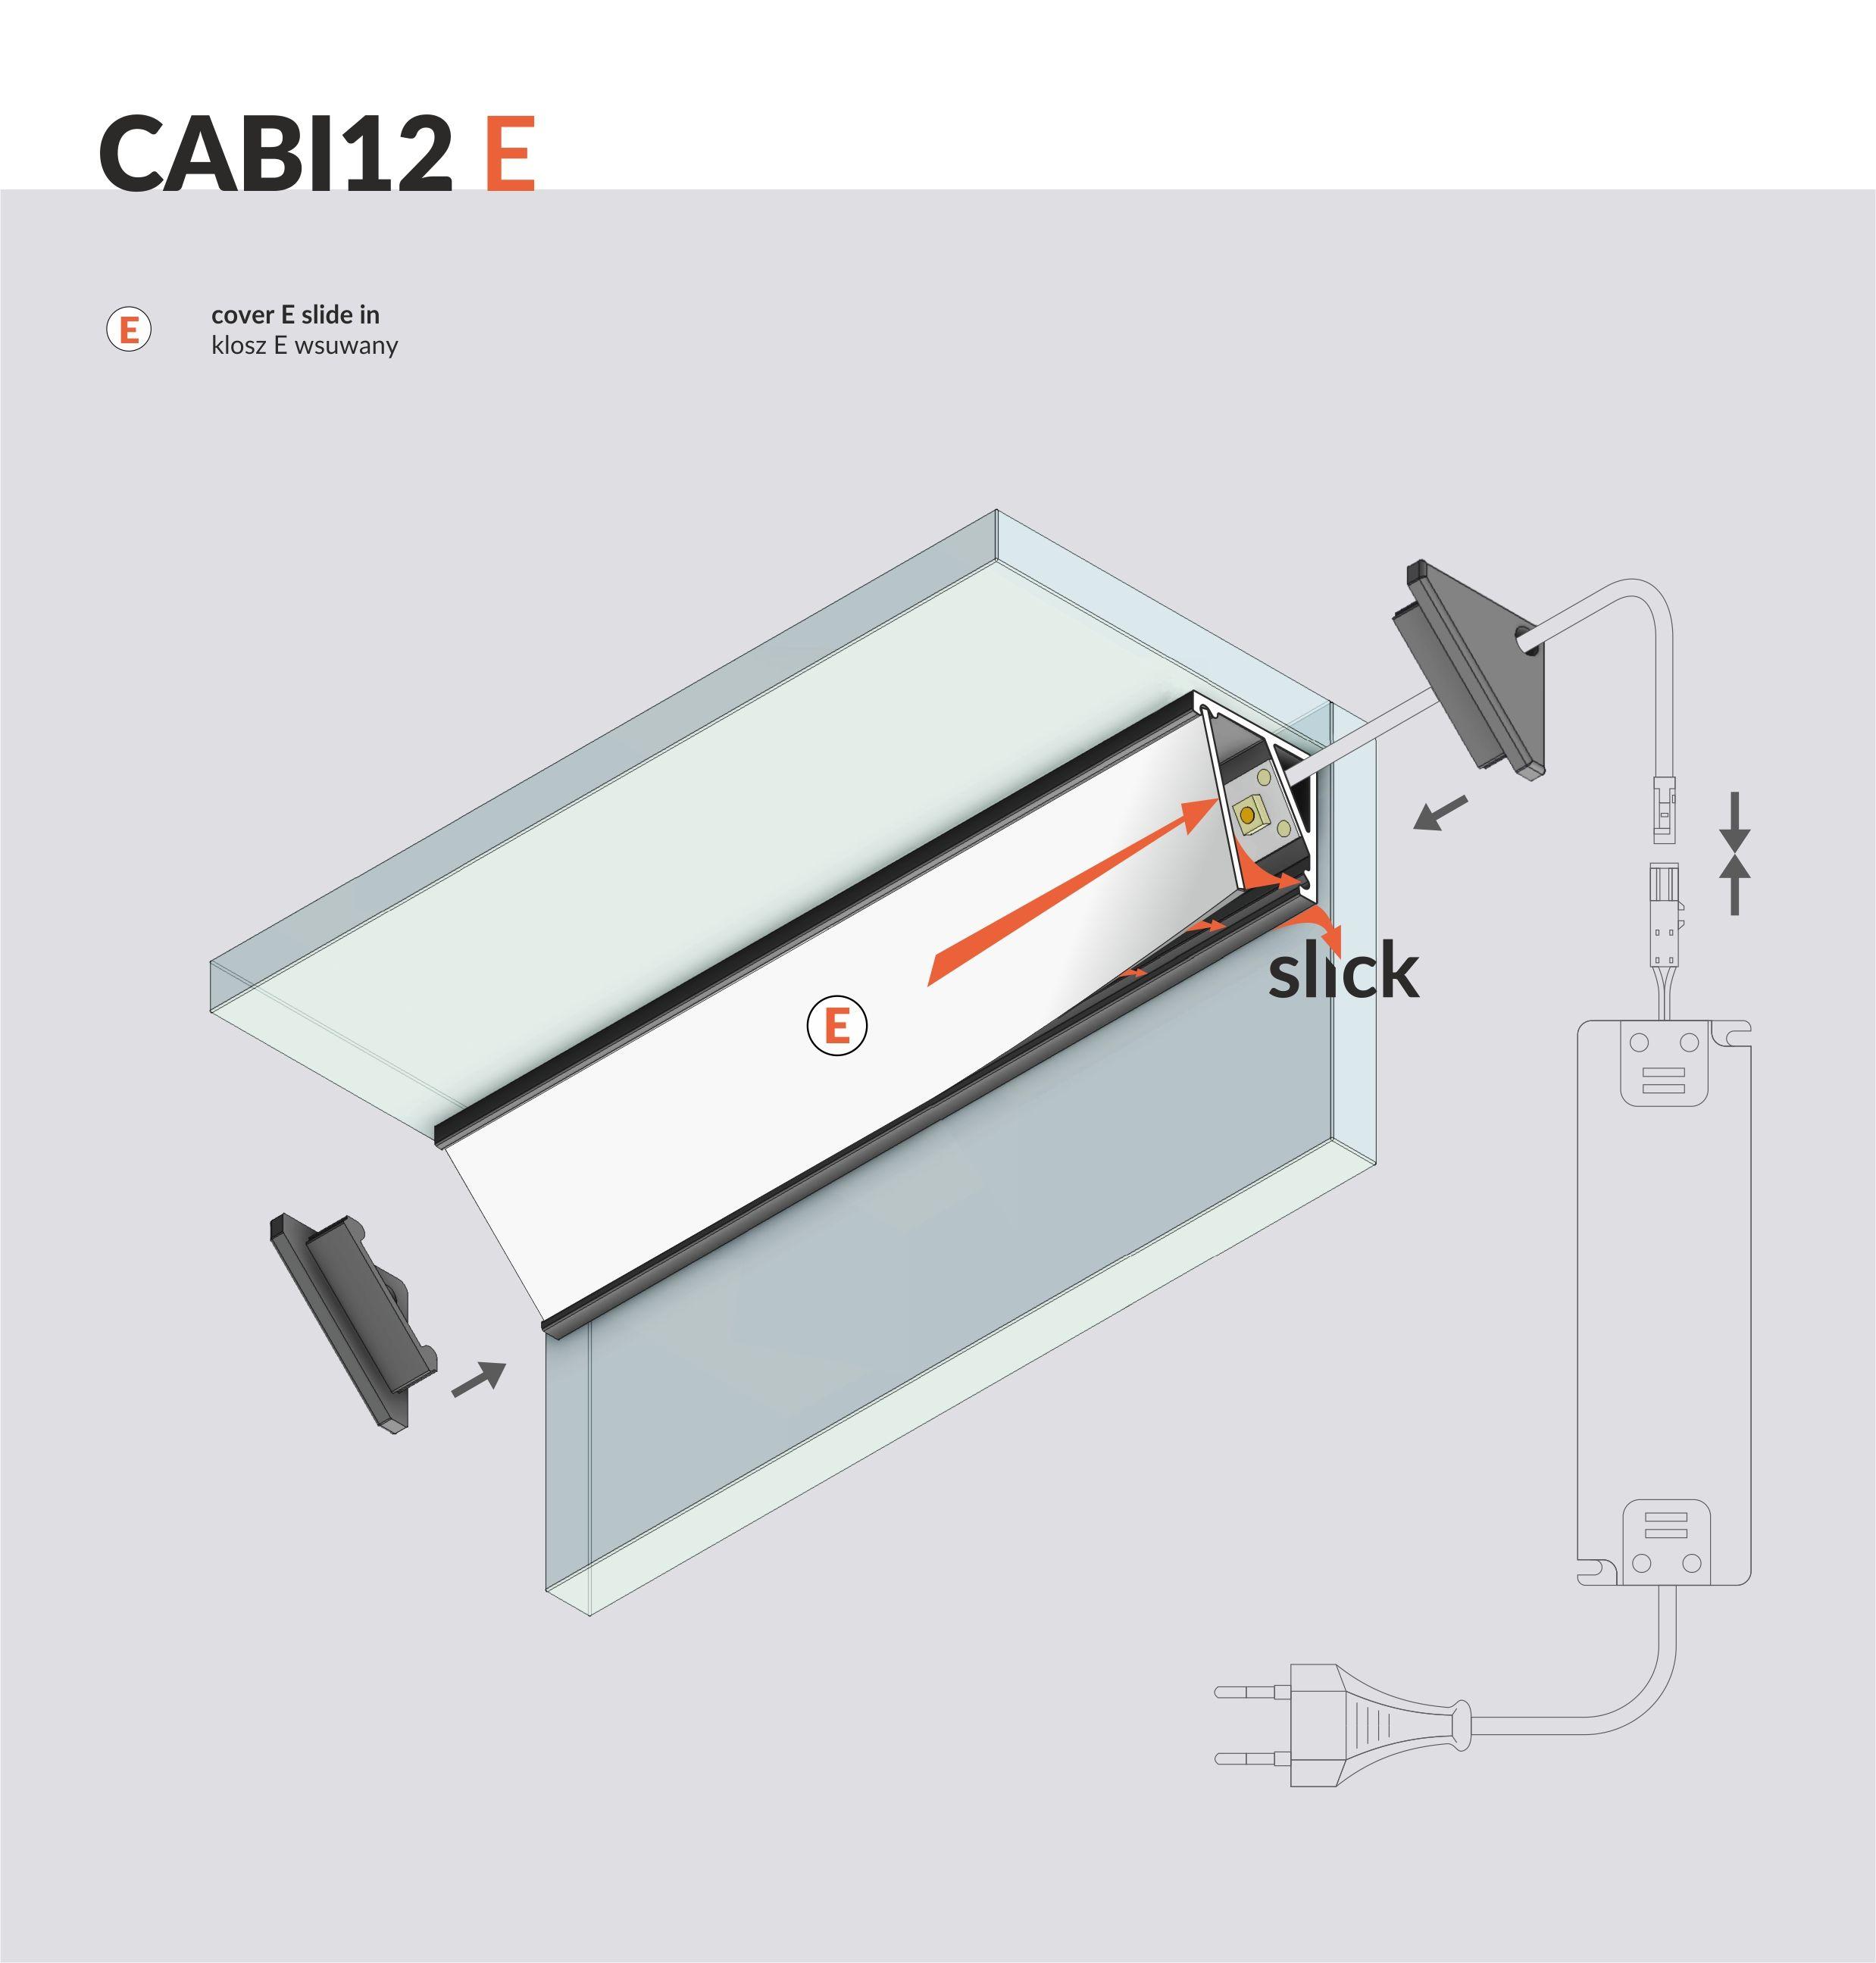 Cabi12 led profile angular profile made of anodized aluminum cabi12 led profile angular profile made of anodized aluminum applications show cases solutioingenieria Images